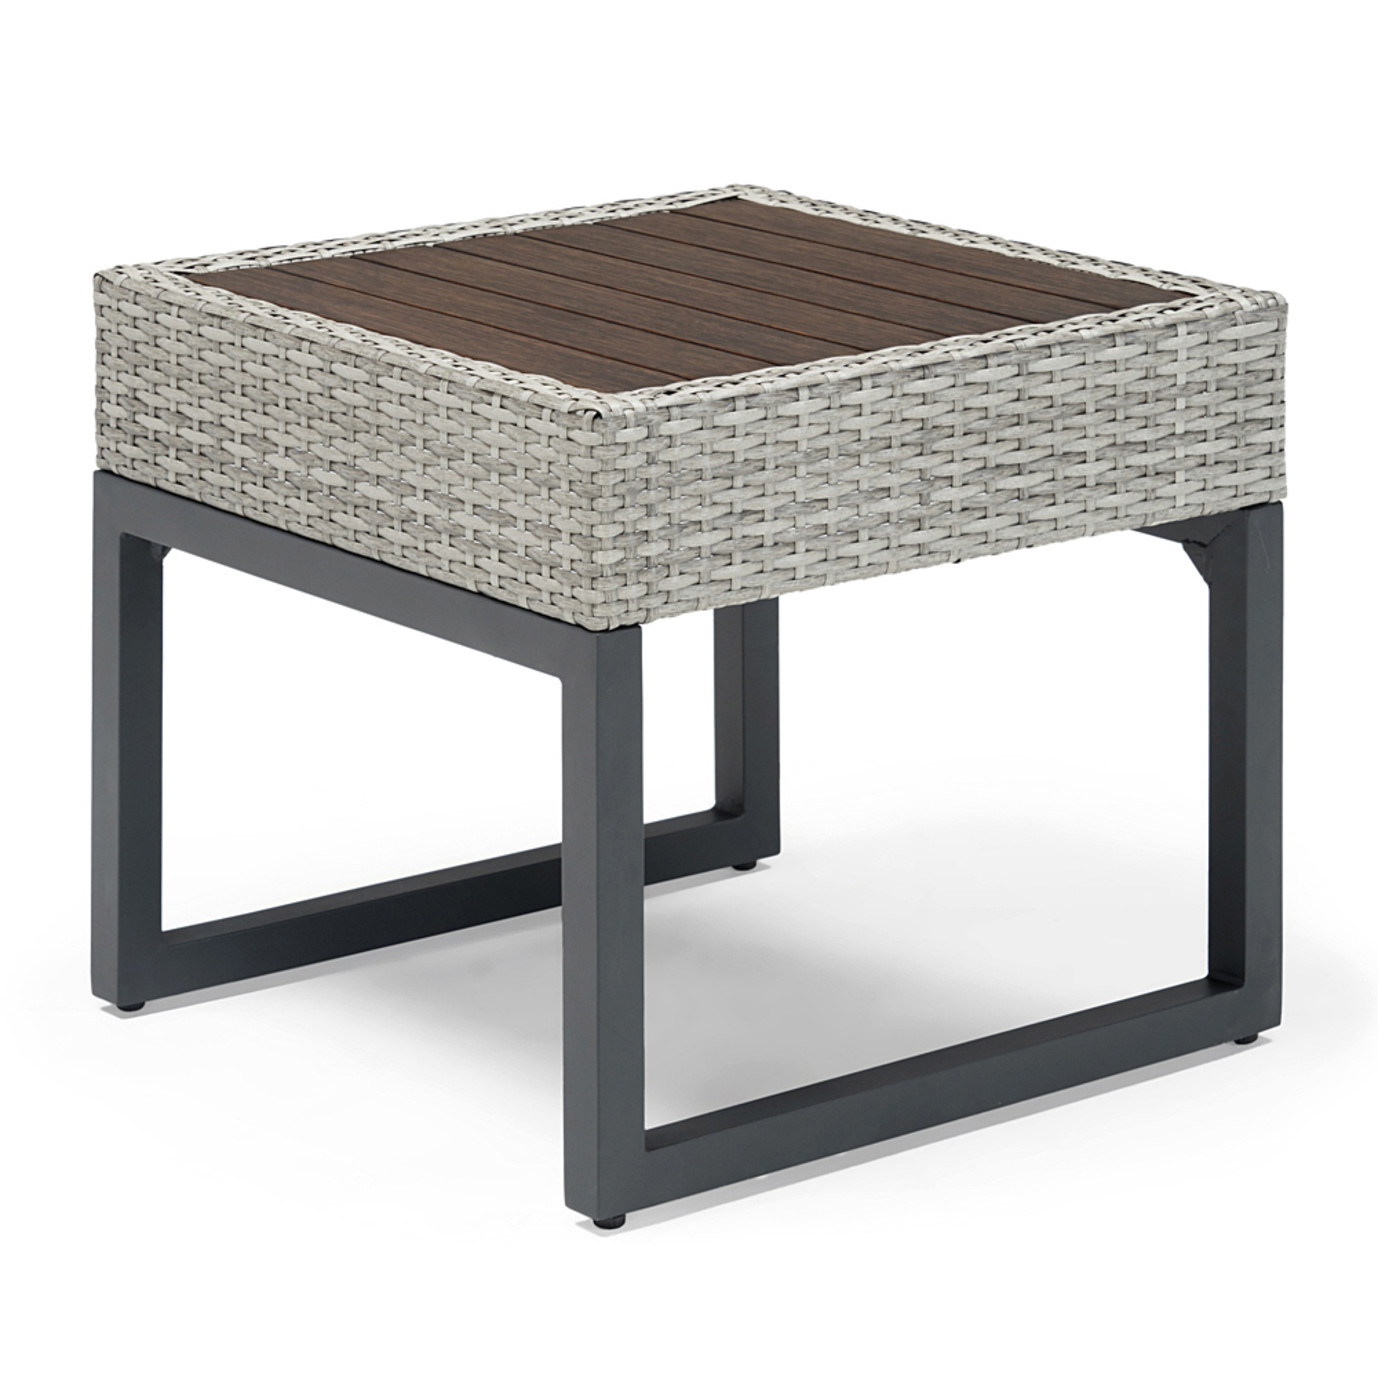 Milo Gray 8 Piece Motion Seating Set - Moroccan Cream